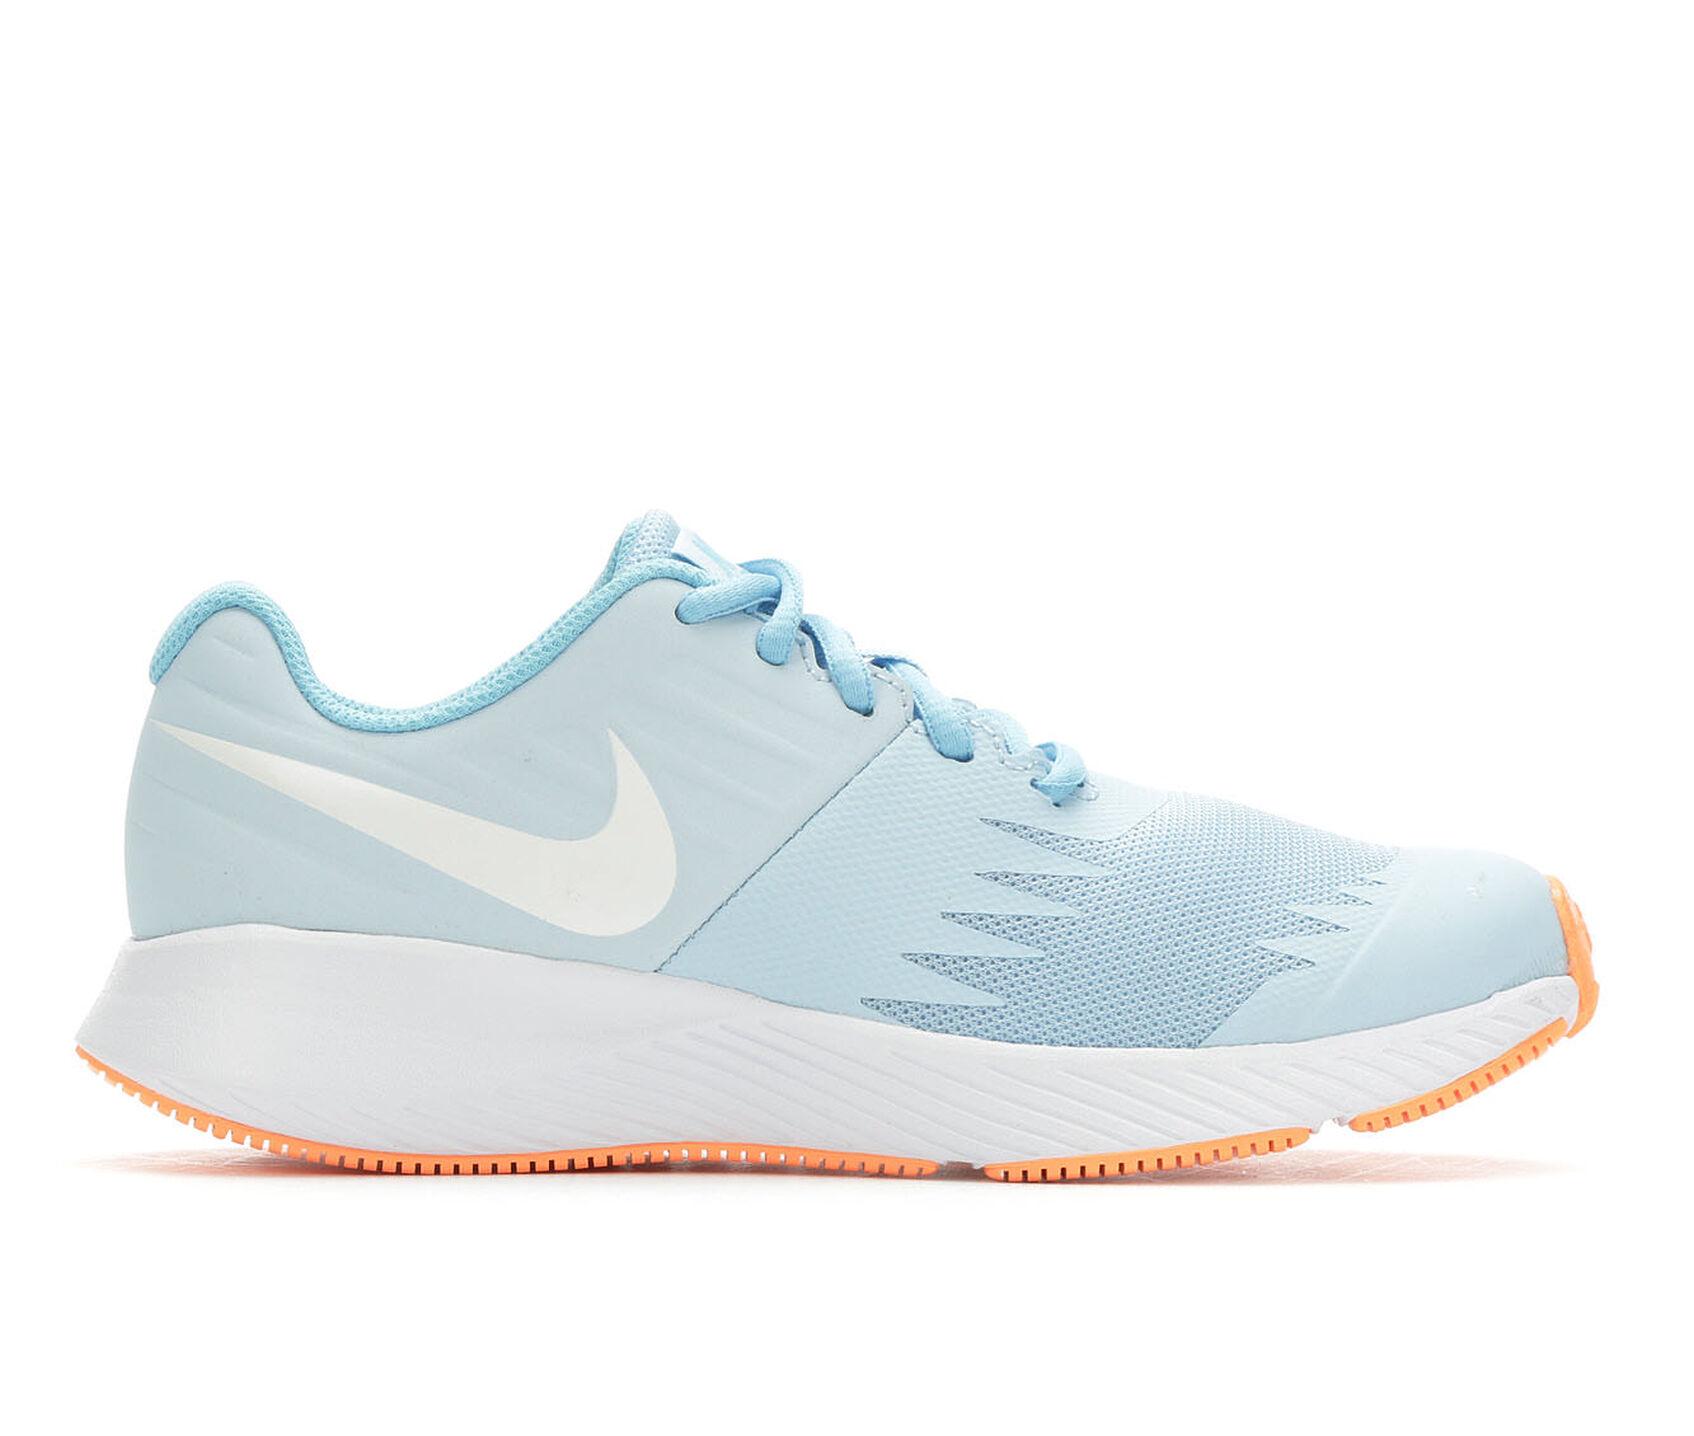 6a0297fe7b9c ... Nike Big Kid Star Runner Running Shoes. Previous